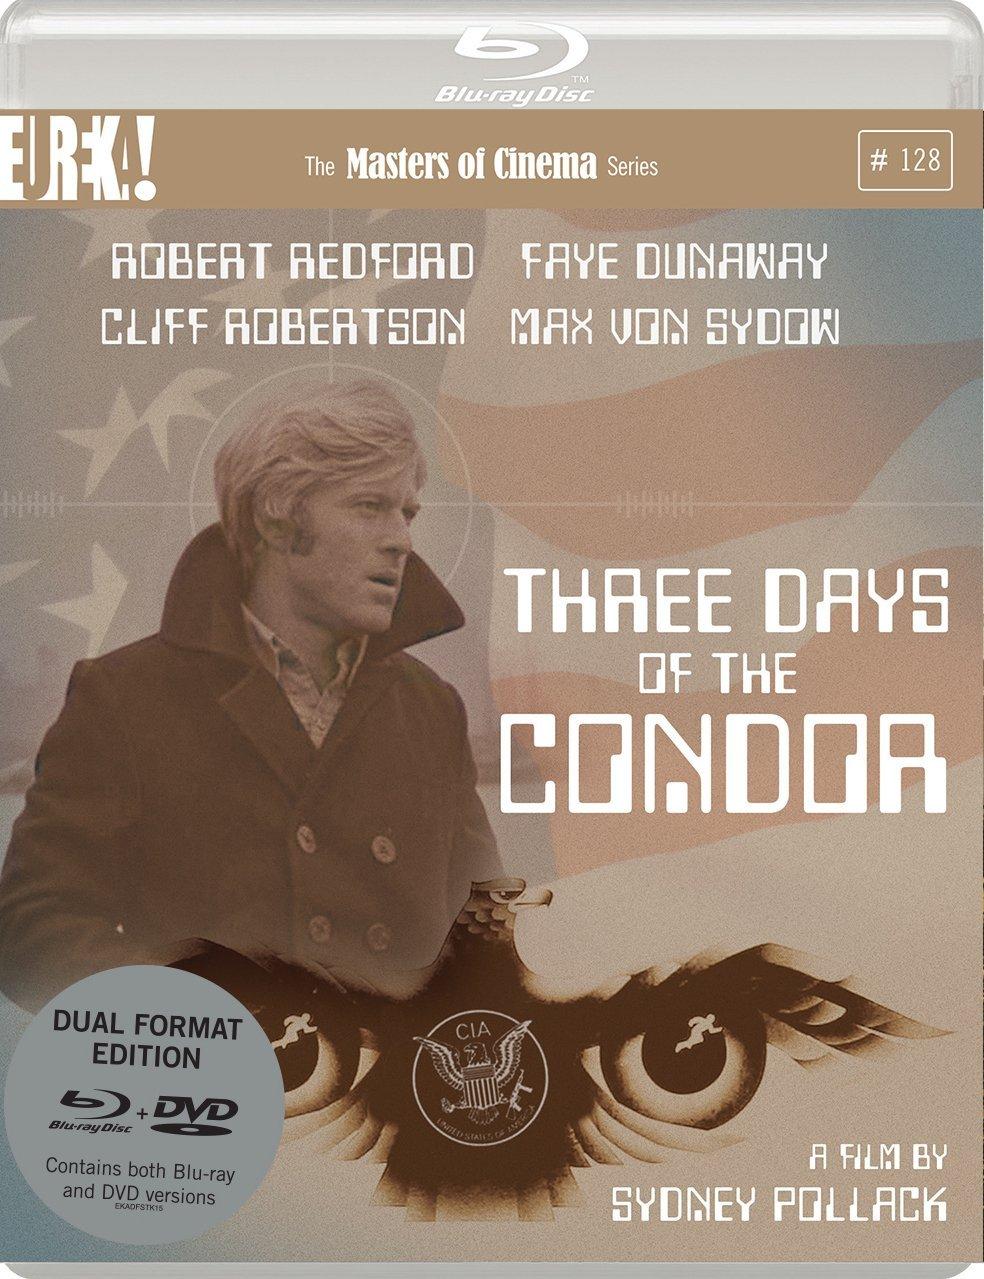 condor-dvd.jpg